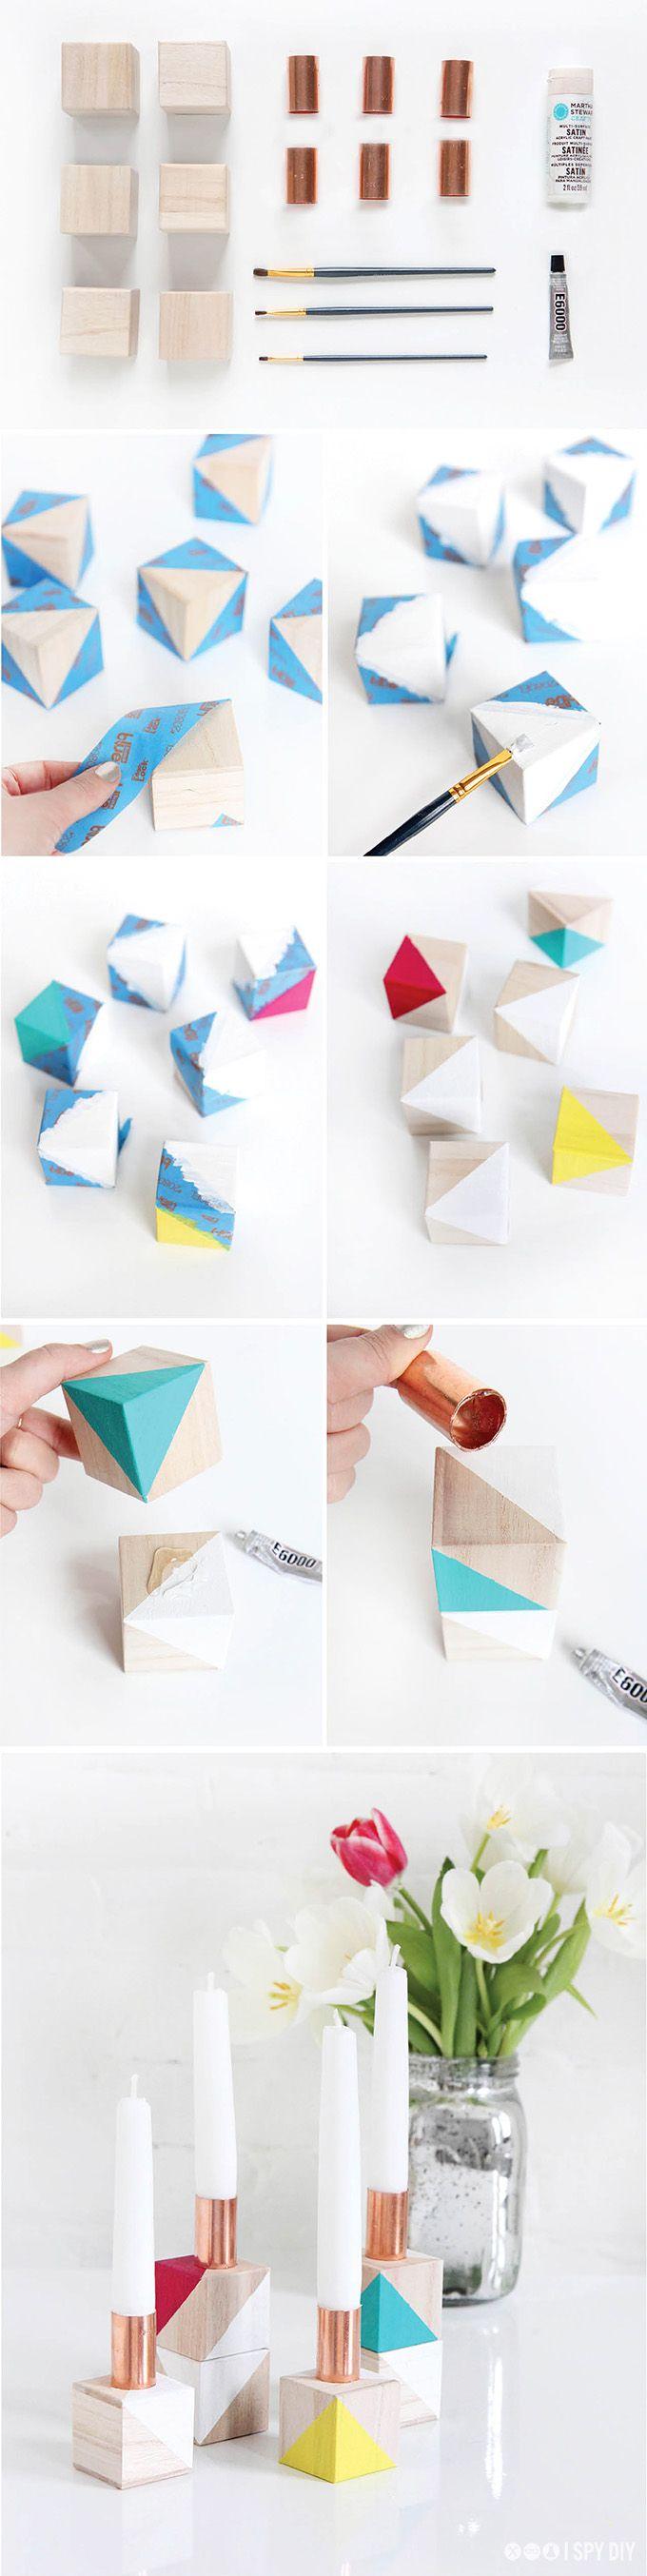 MY DIY   Color Block Candlestick Holders   I SPY DIY